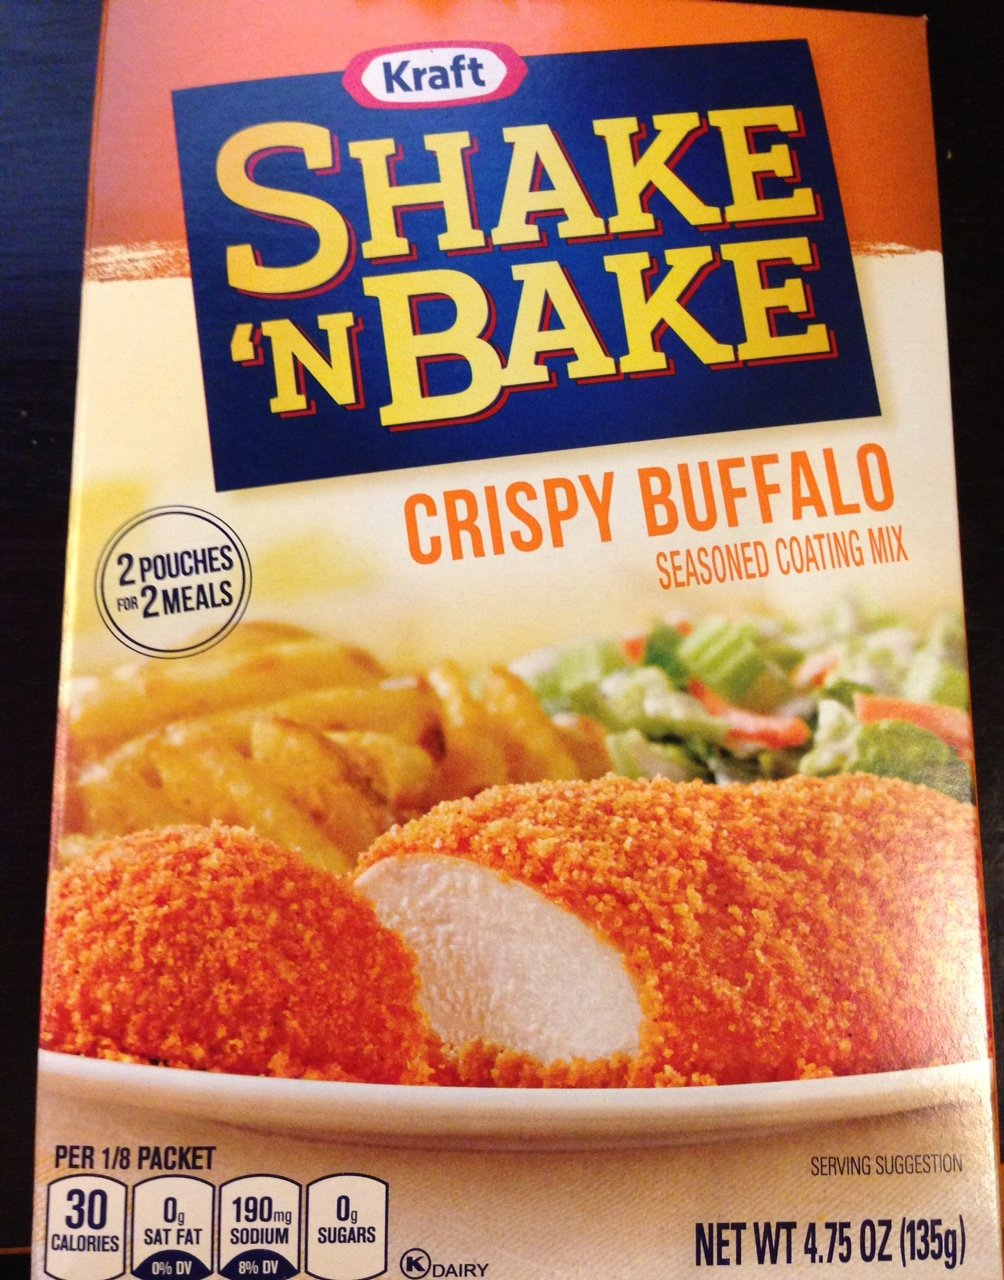 Shake 'N Bake Crispy Buffalo Seasoned Coating Mix 4.75 Oz (Pack of 3)